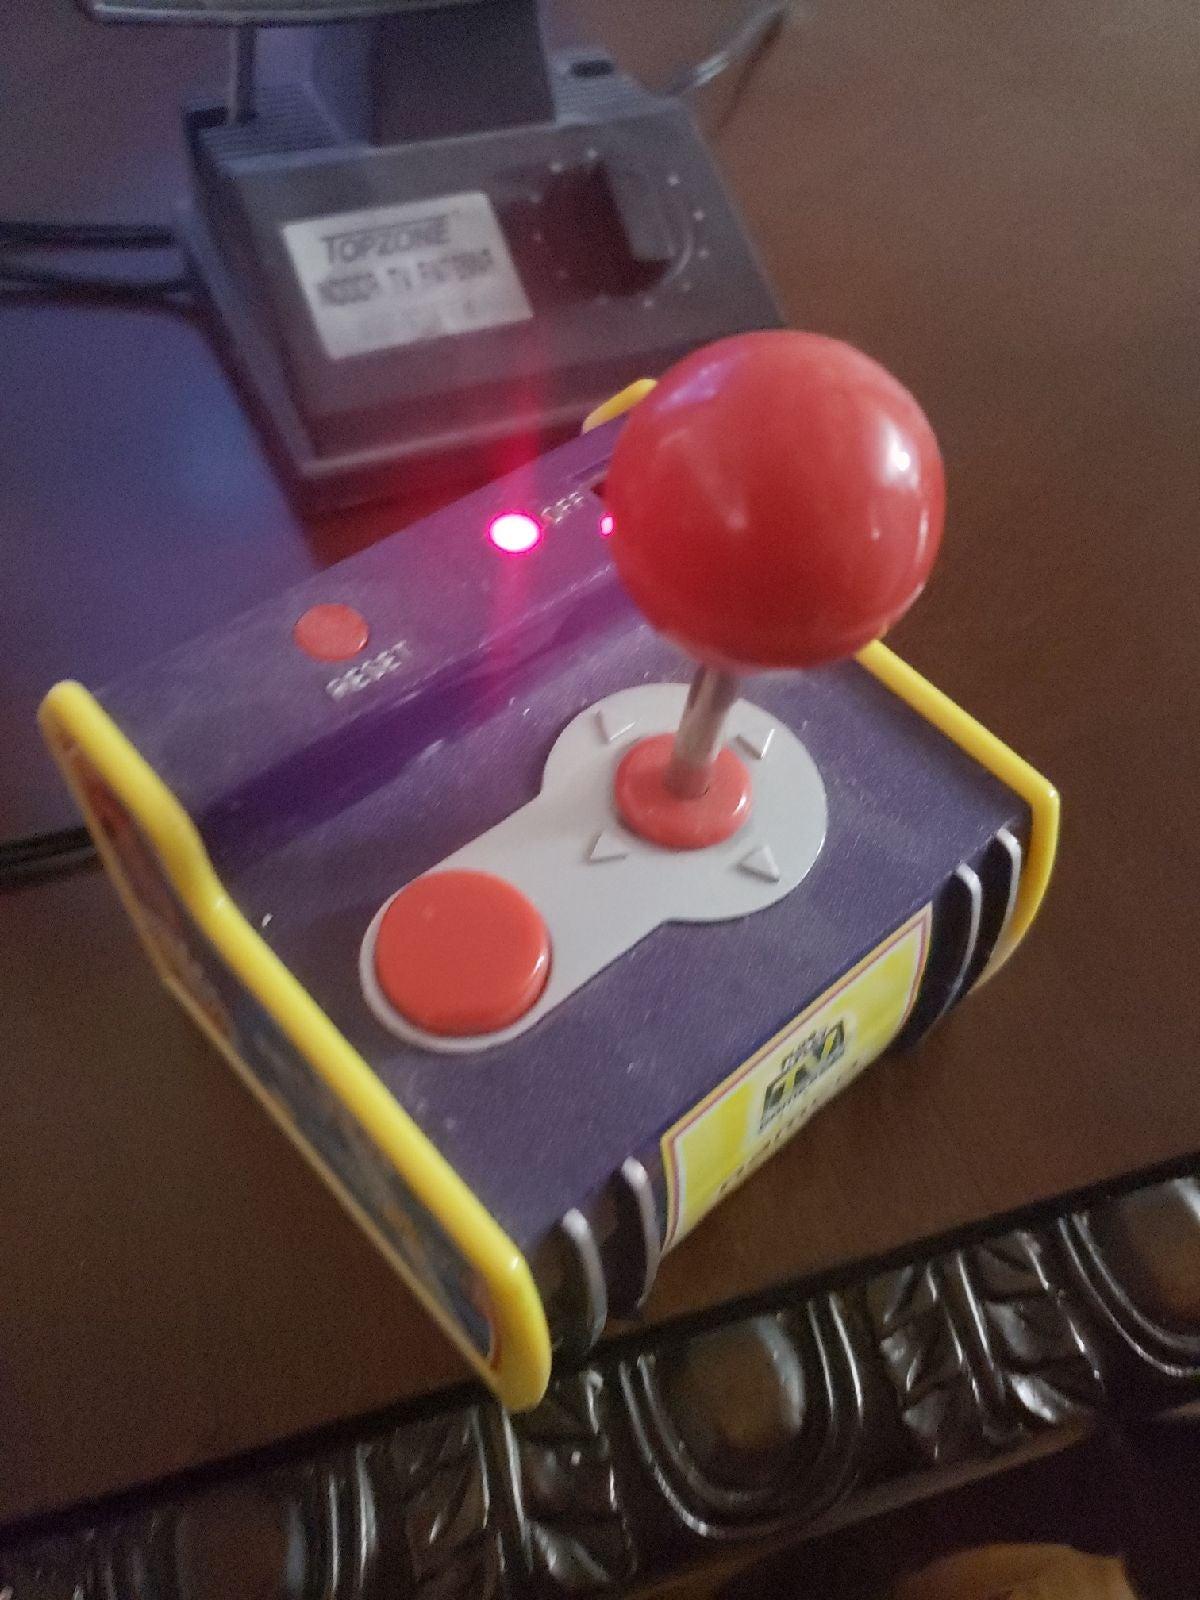 Plug game tv games